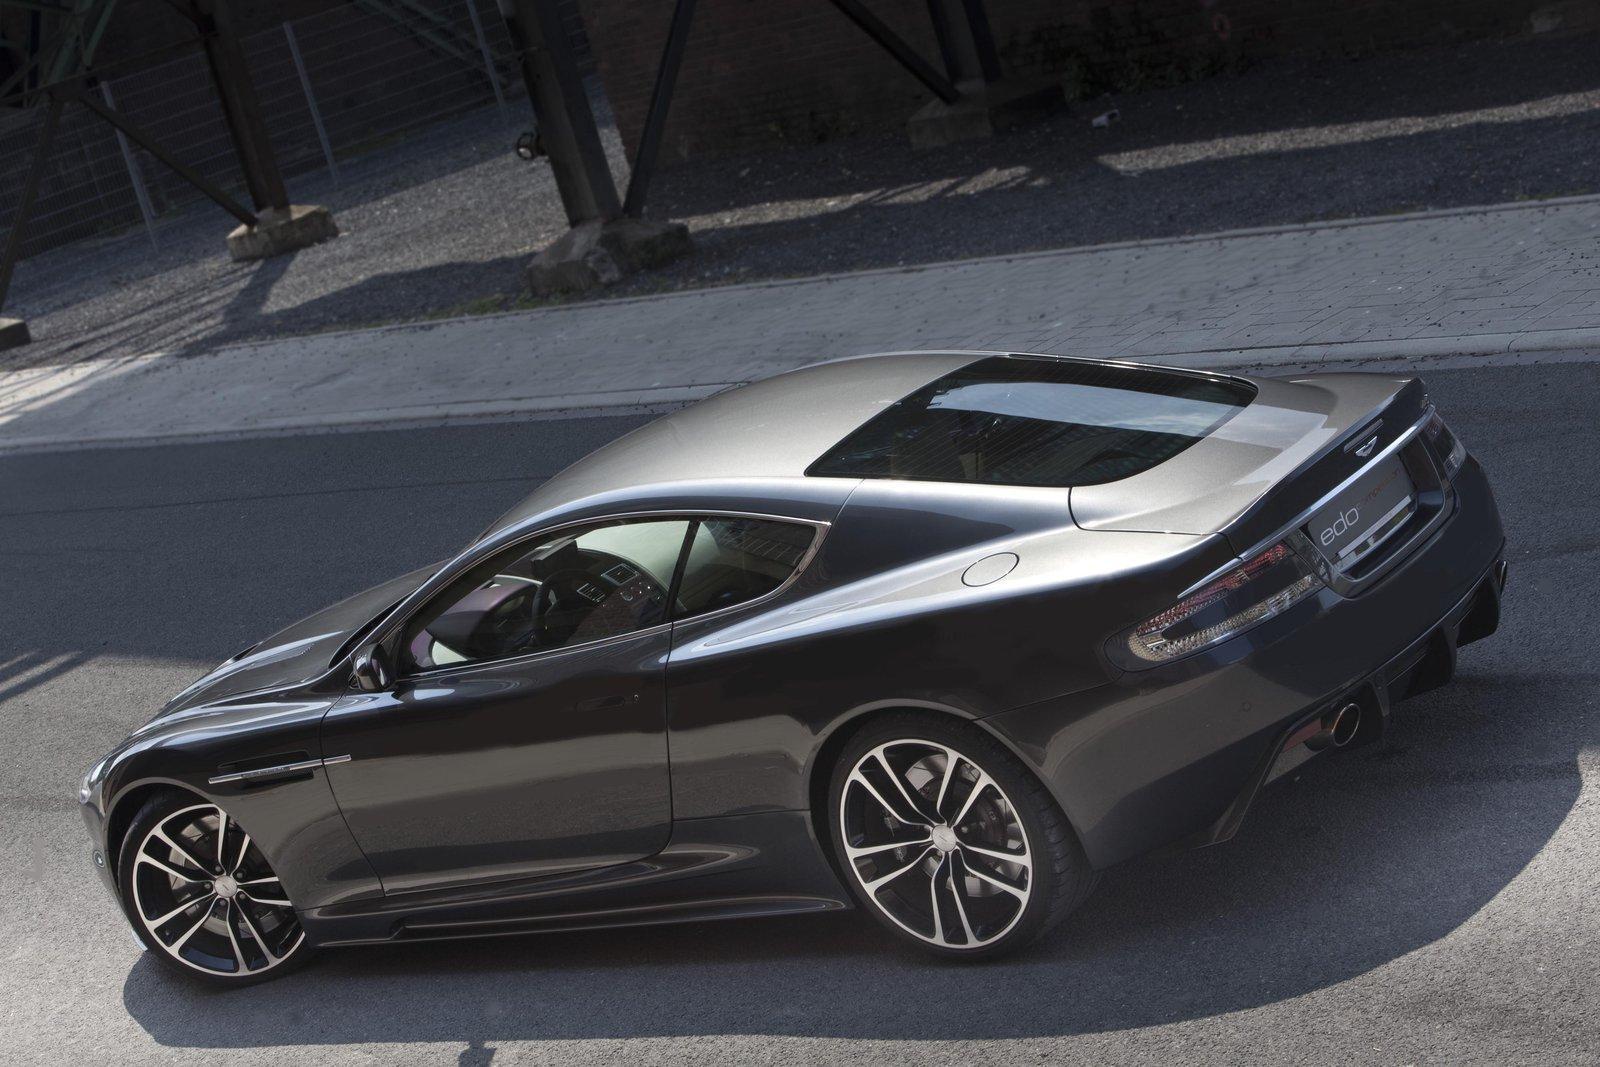 Aston Martin DB9 Free Wallpaper Download Wallpaper